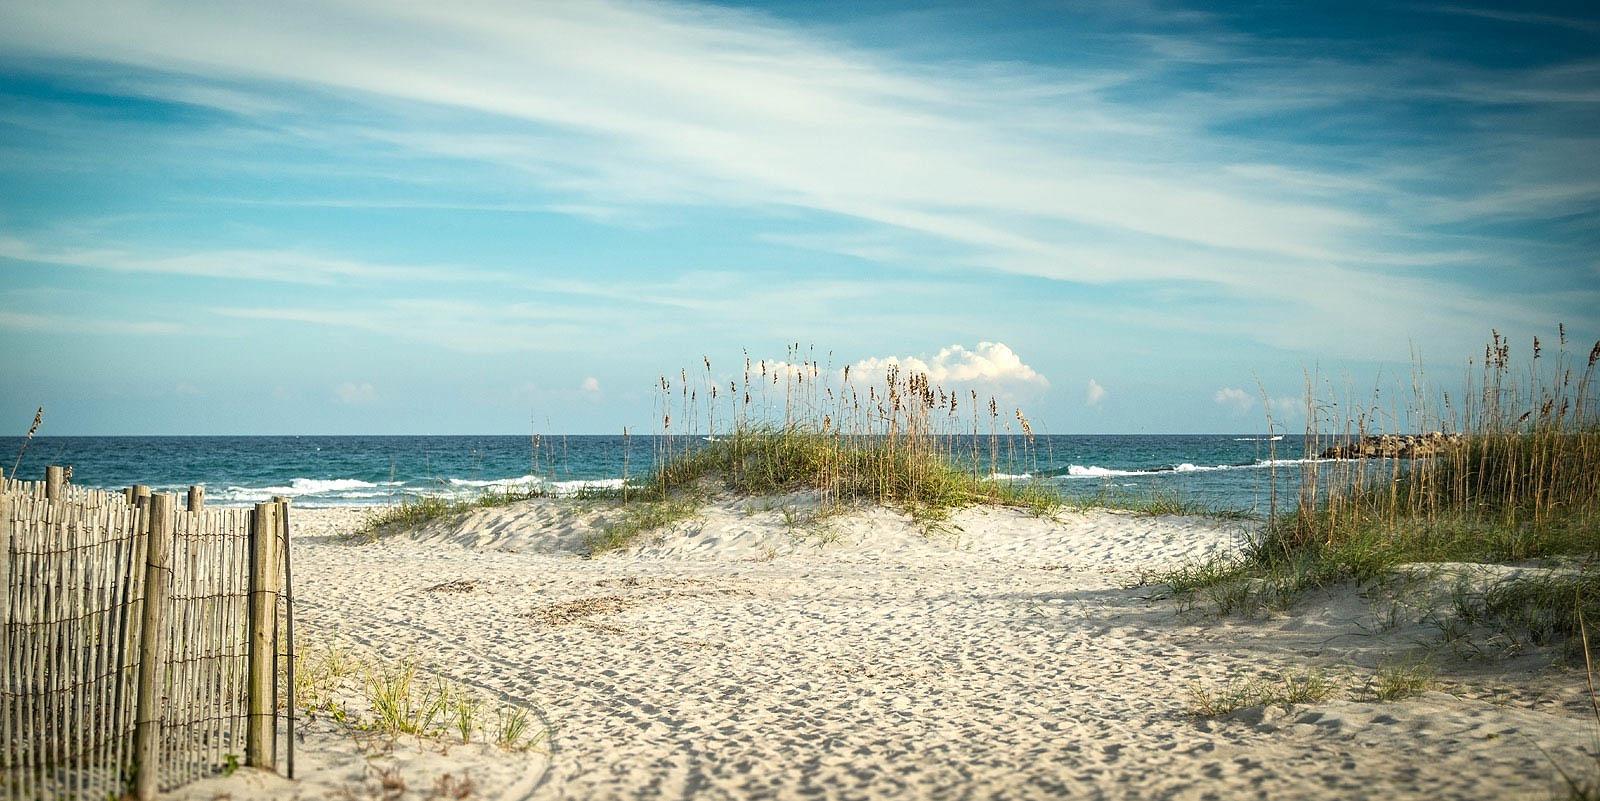 Beach View in Wilmington, NC